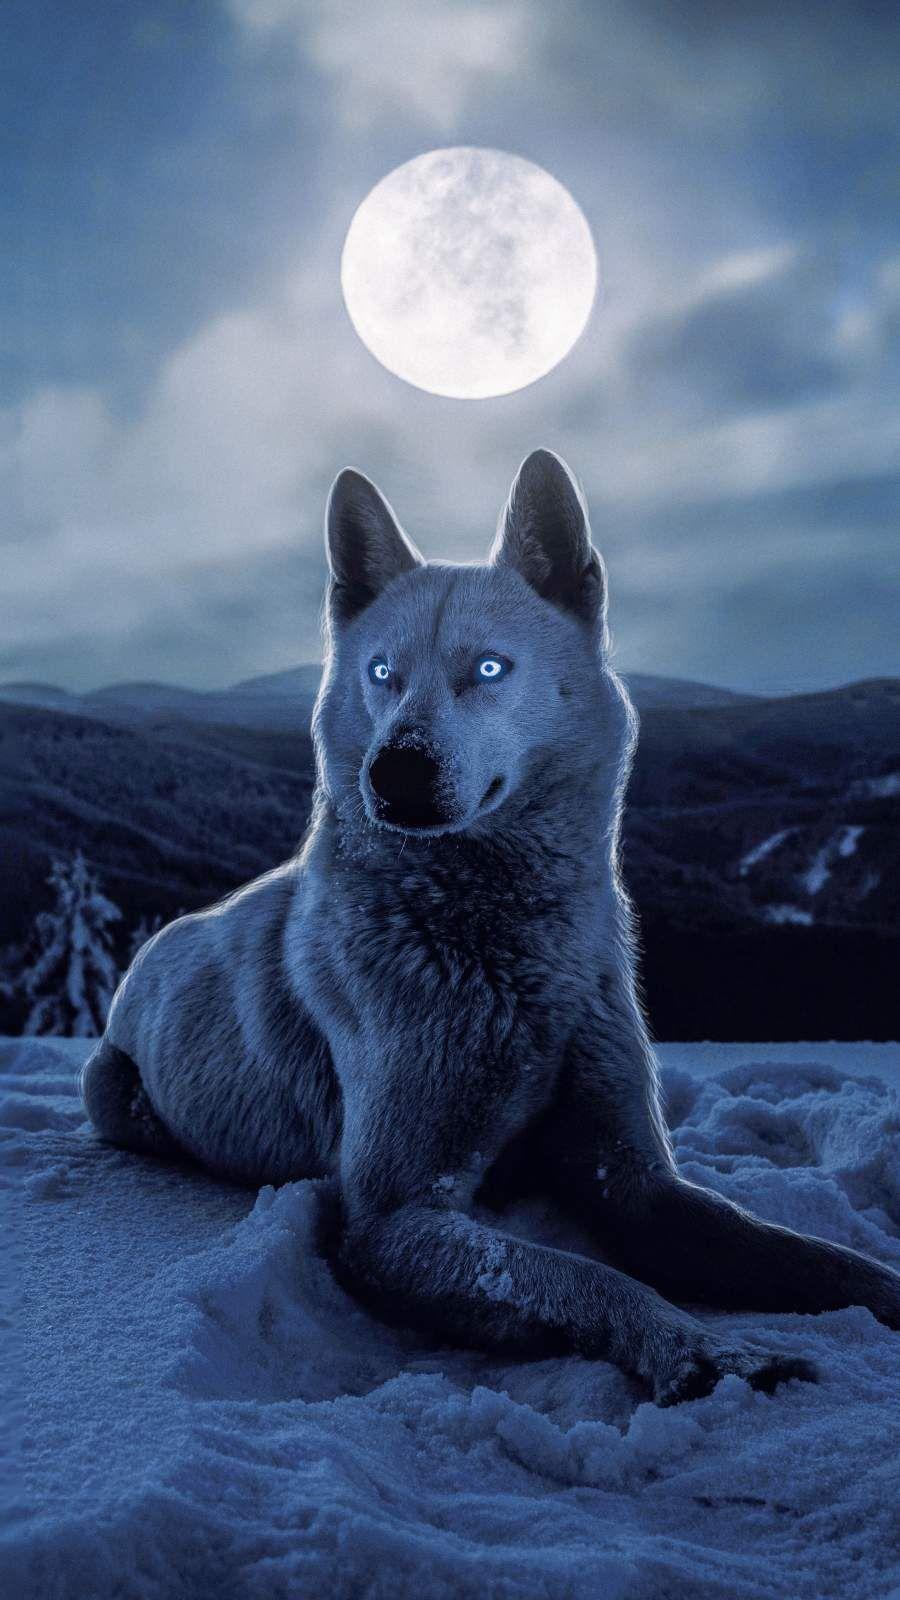 White Wolf Iphone Wallpaper 動物 おしゃれな壁紙背景 壁紙